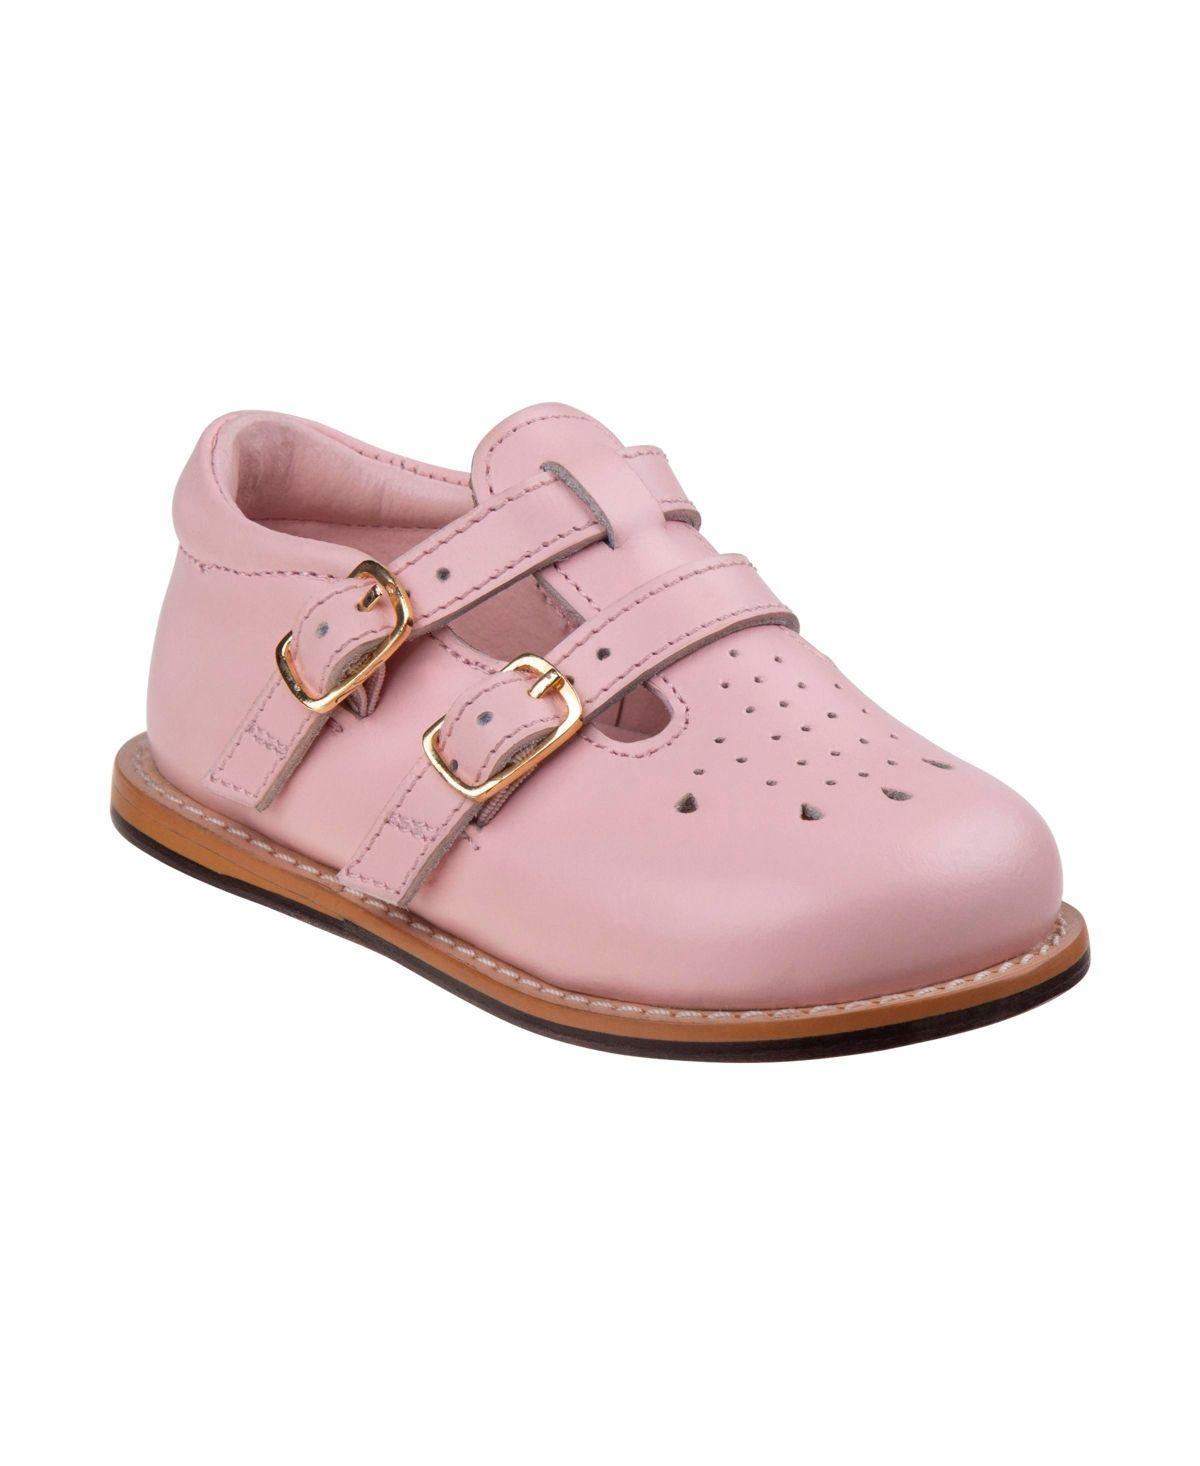 Toddler Boys and Girls Walking Shoes